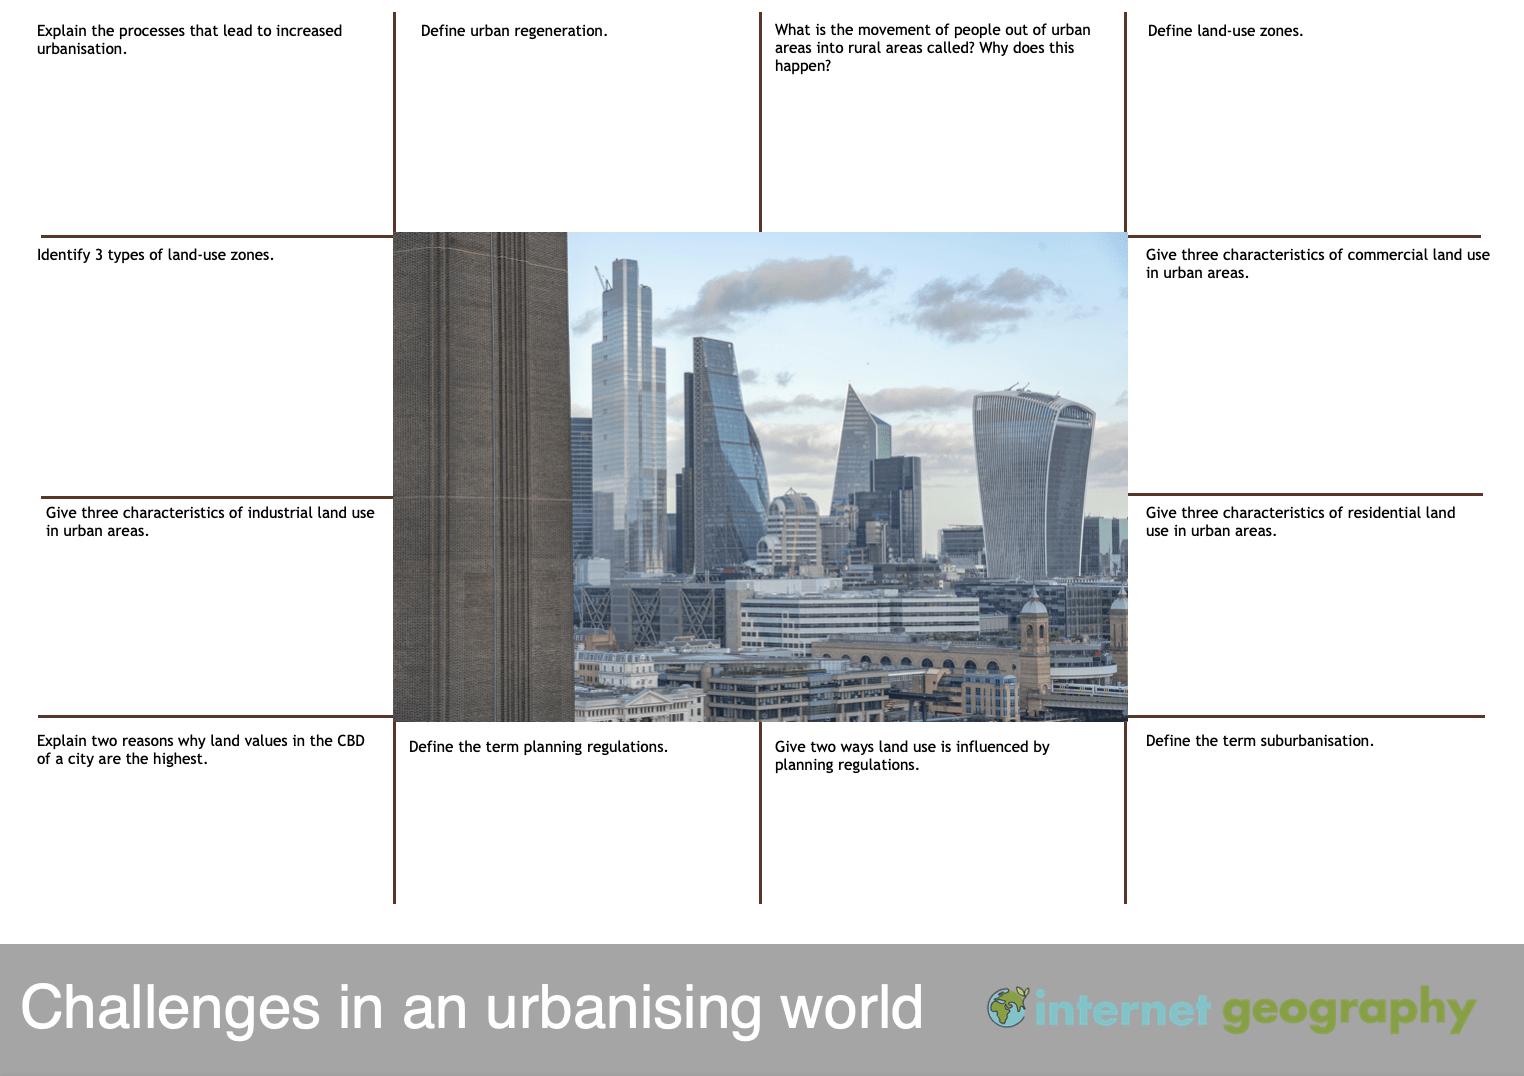 Challenges in an urbanising world revision mat 2 edexcel b